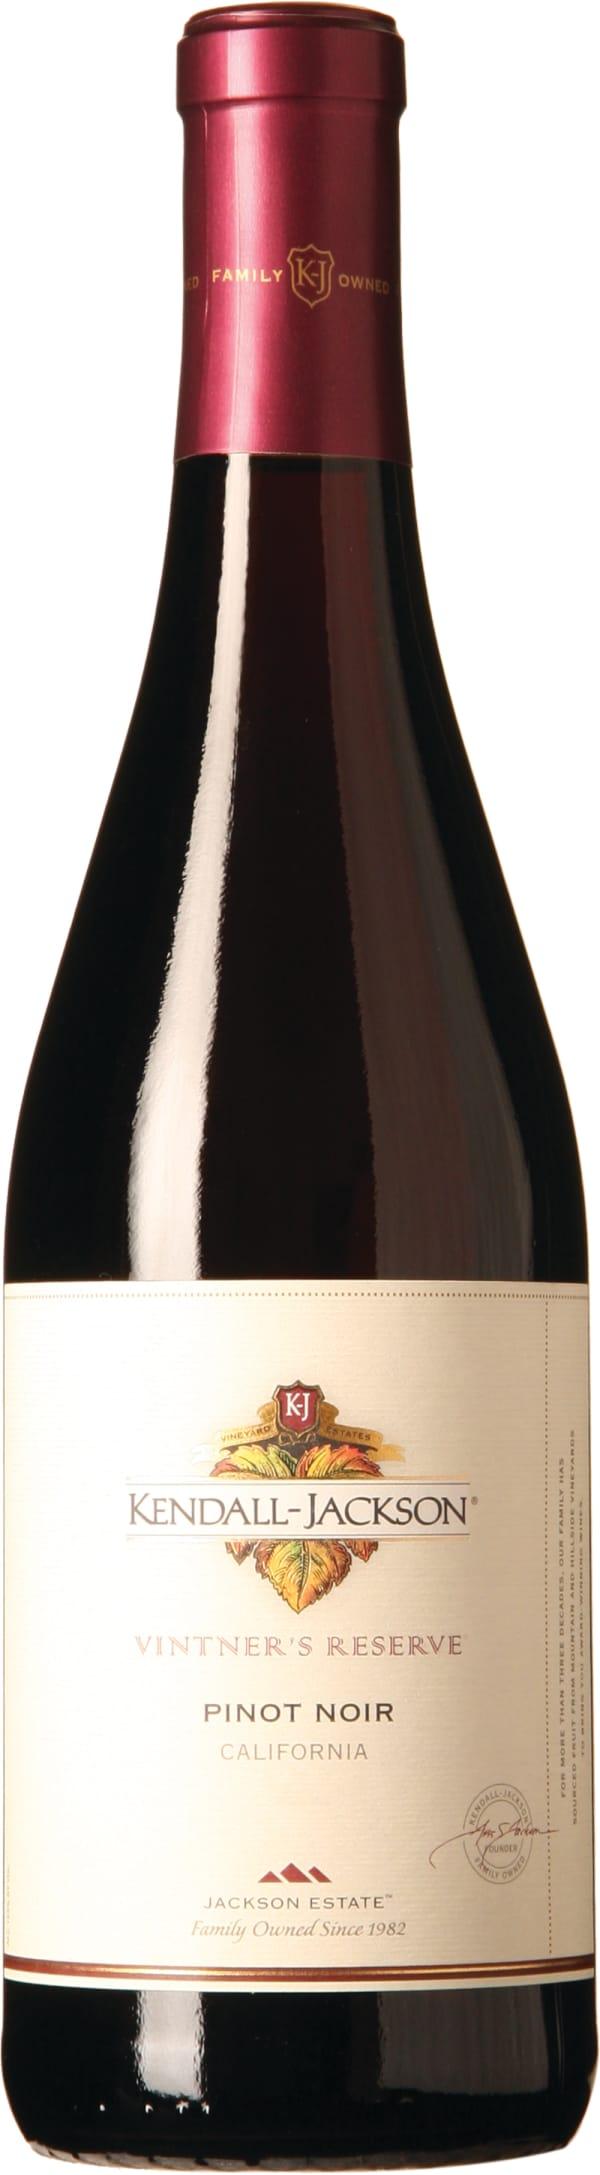 Kendall Jackson Vintners Reserve Pinot Noir 2017